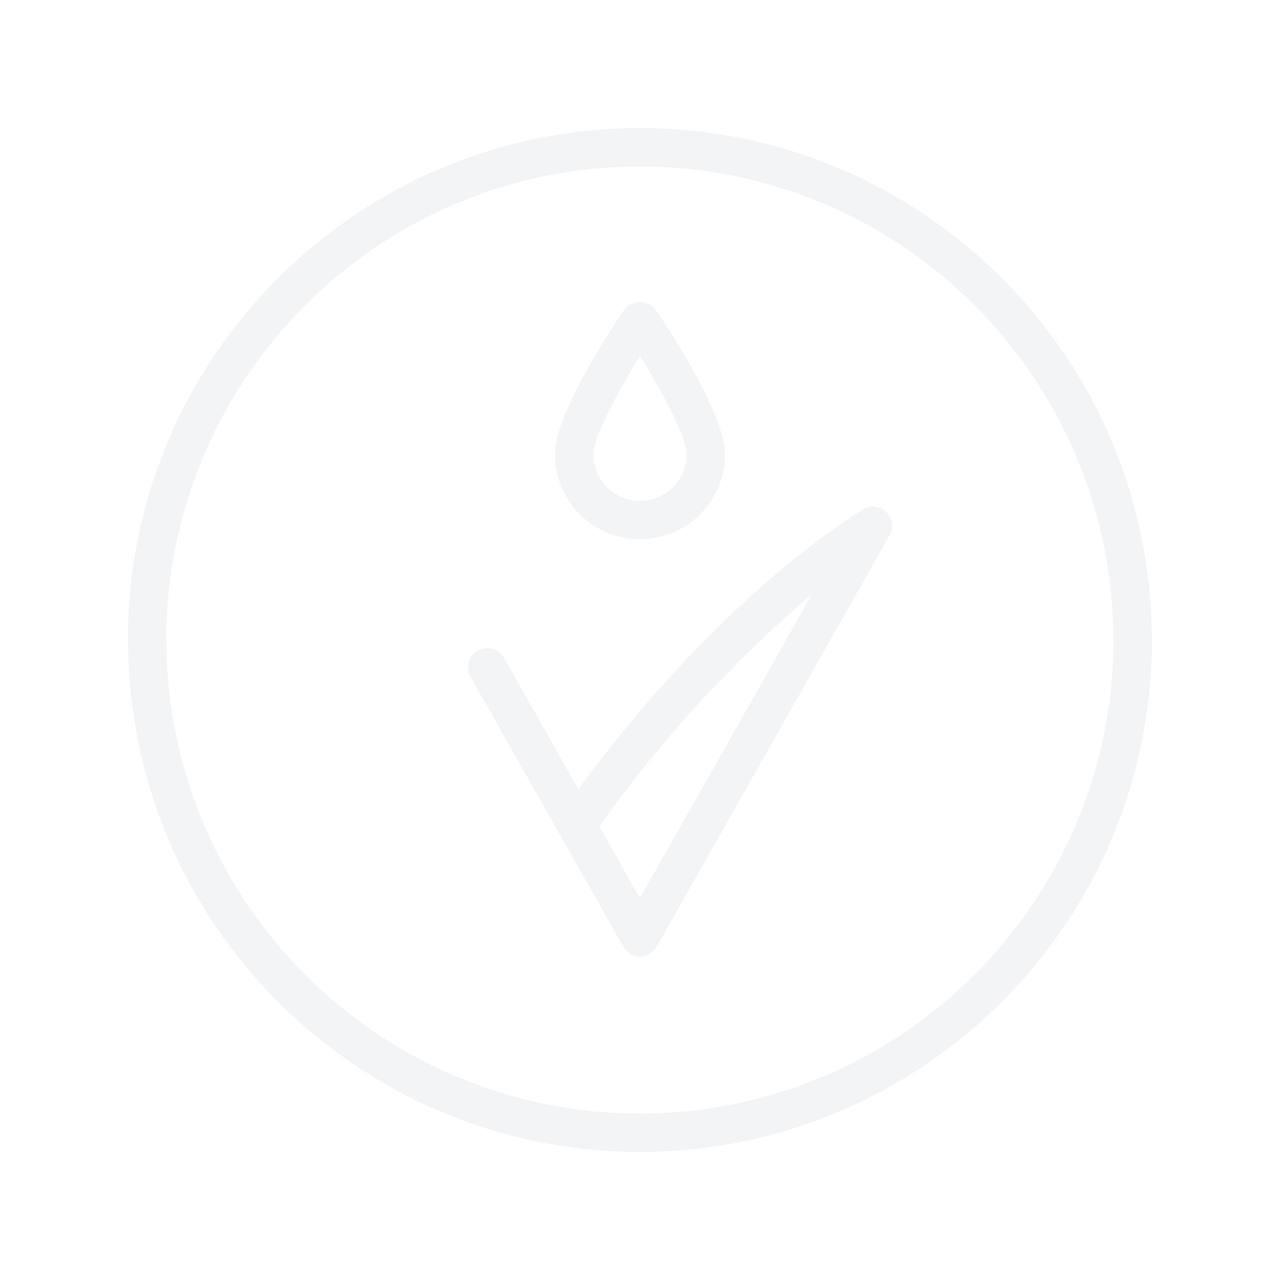 HOLIKA HOLIKA Holi Pop Lash Maker No.03 Party Time